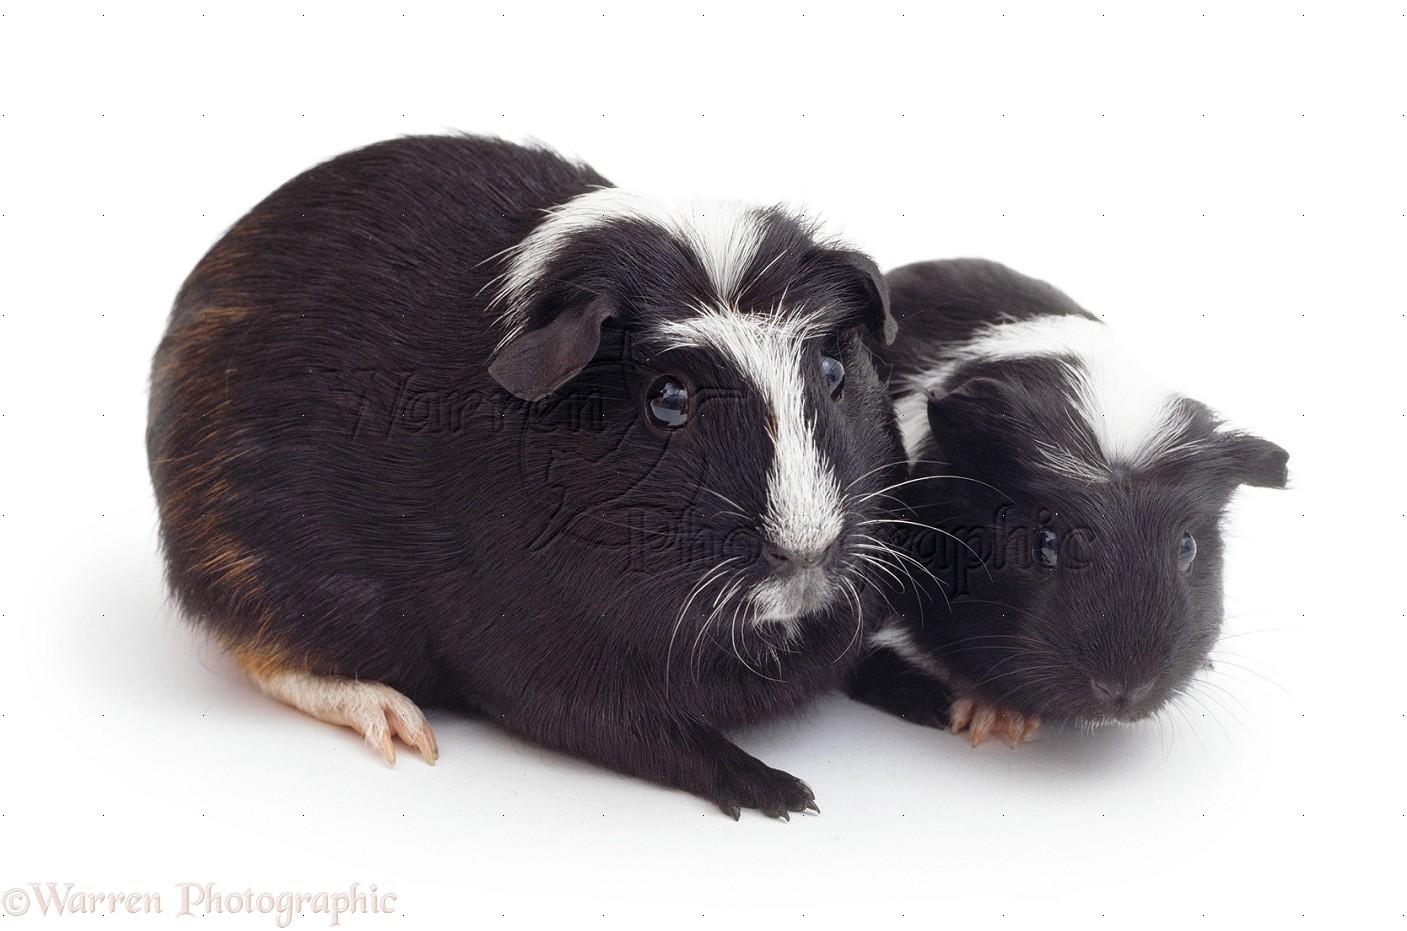 Crested guinea pig - photo#26